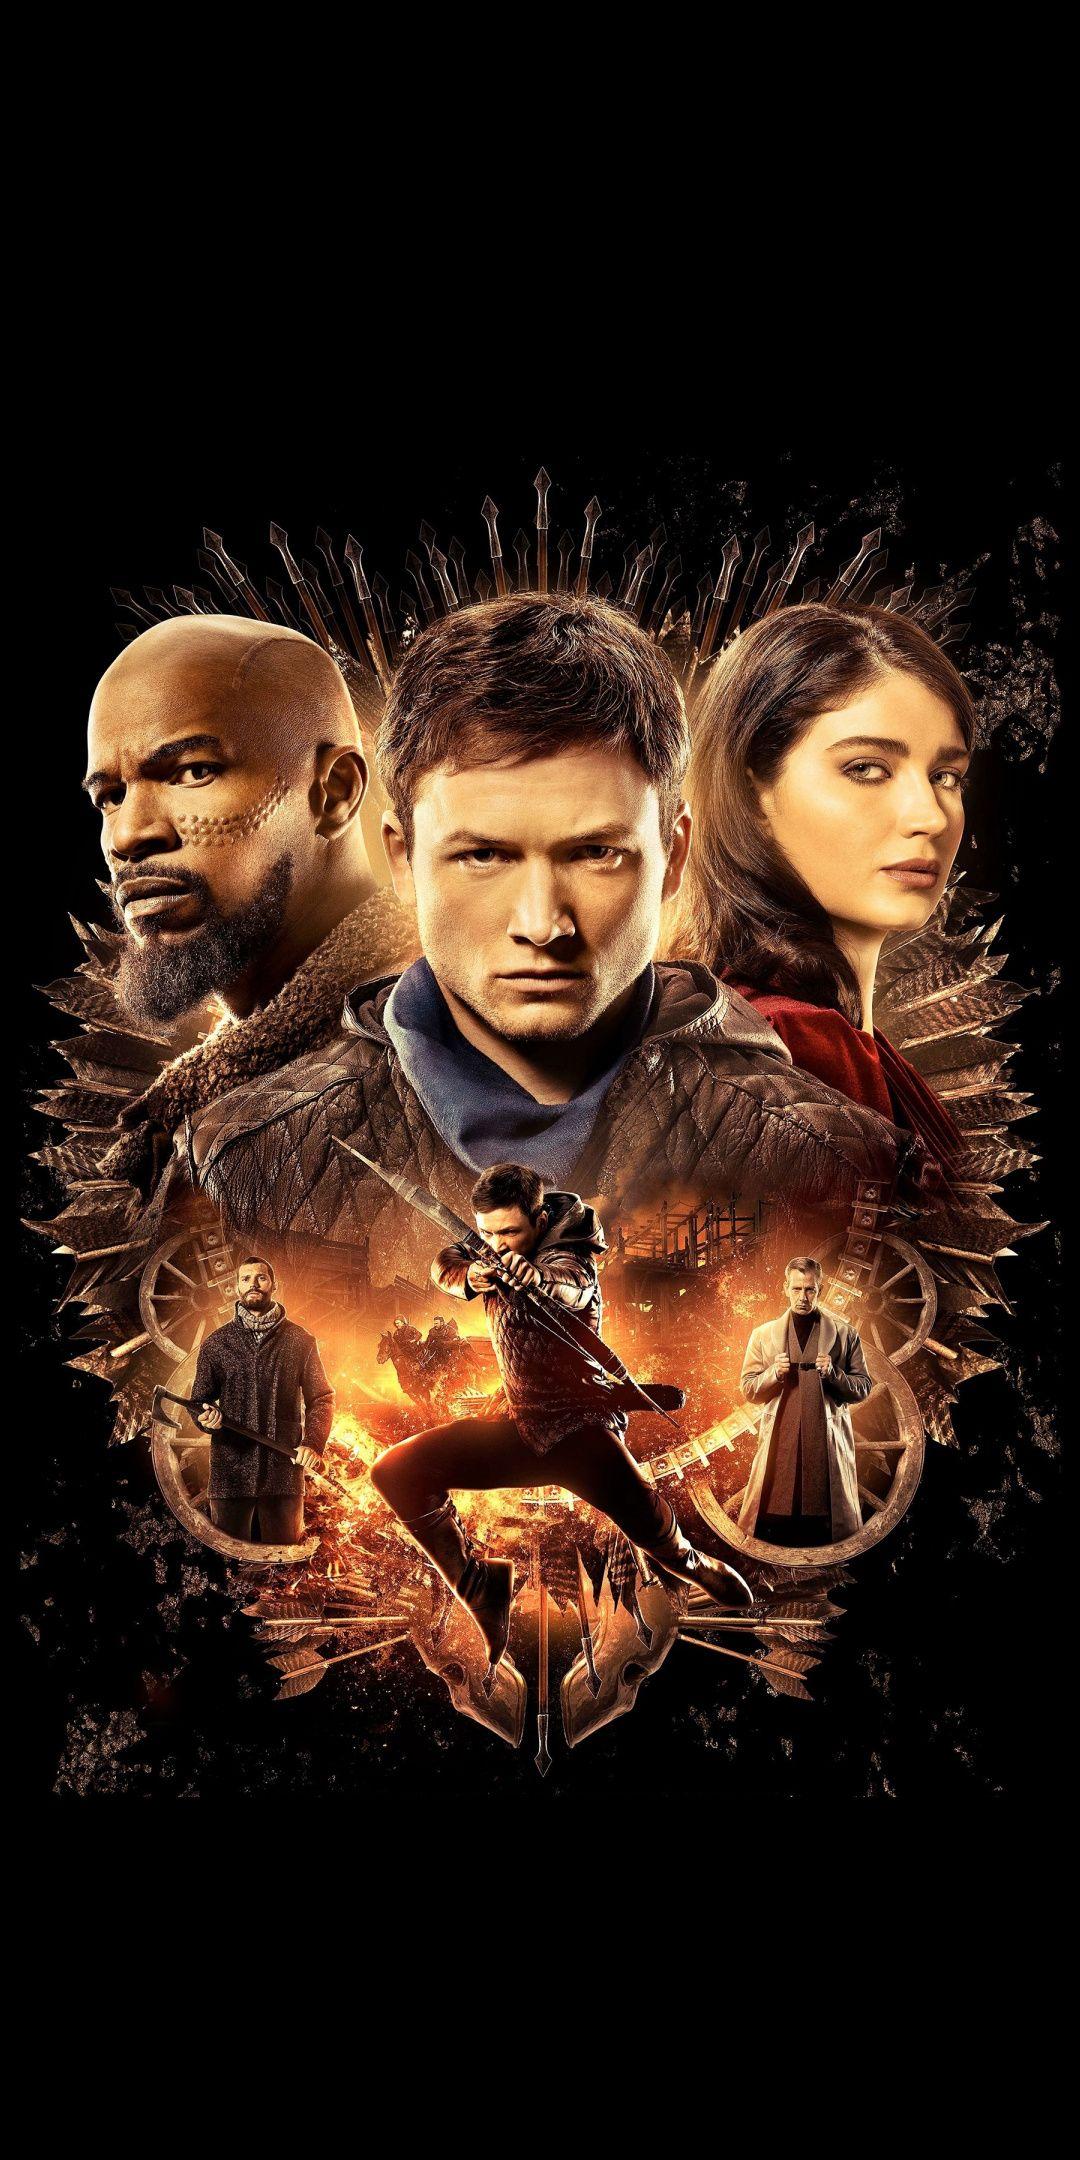 Robin Hood Movie Poster 2018 1080x2160 Wallpaper Robin Hood Hood Wallpapers Movie Posters